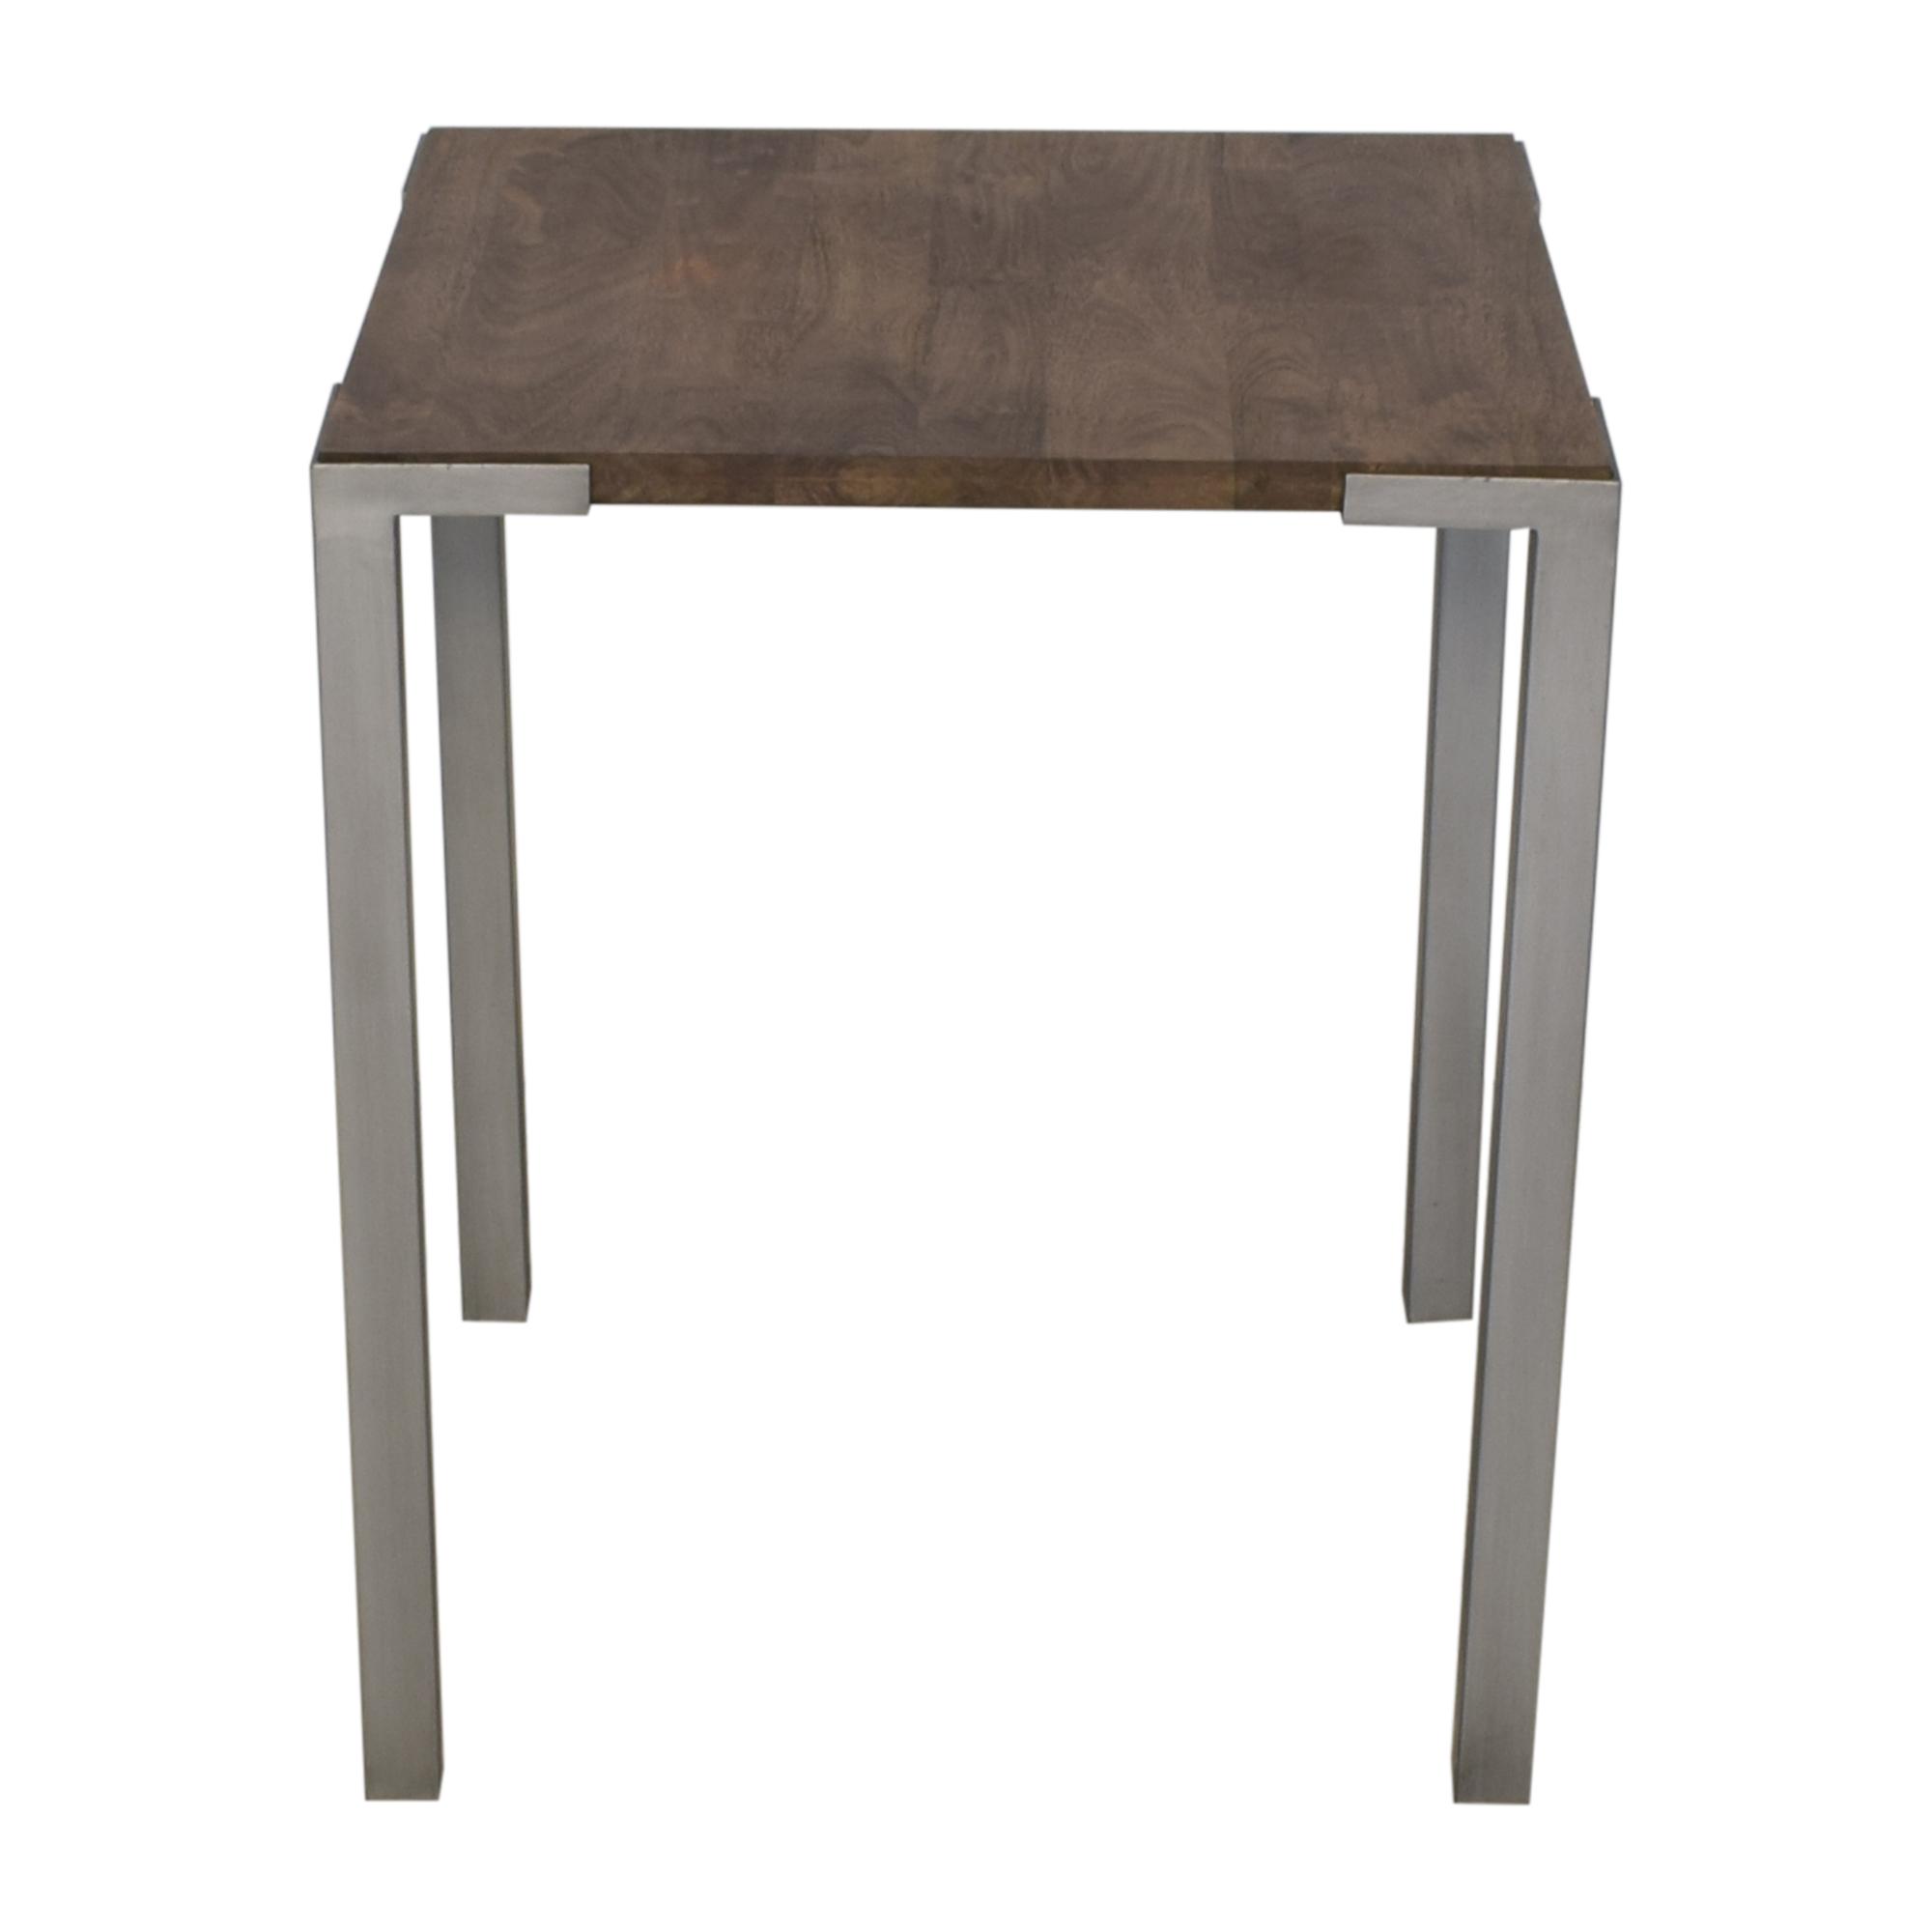 CB2 Stilt Dining Table / Dinner Tables